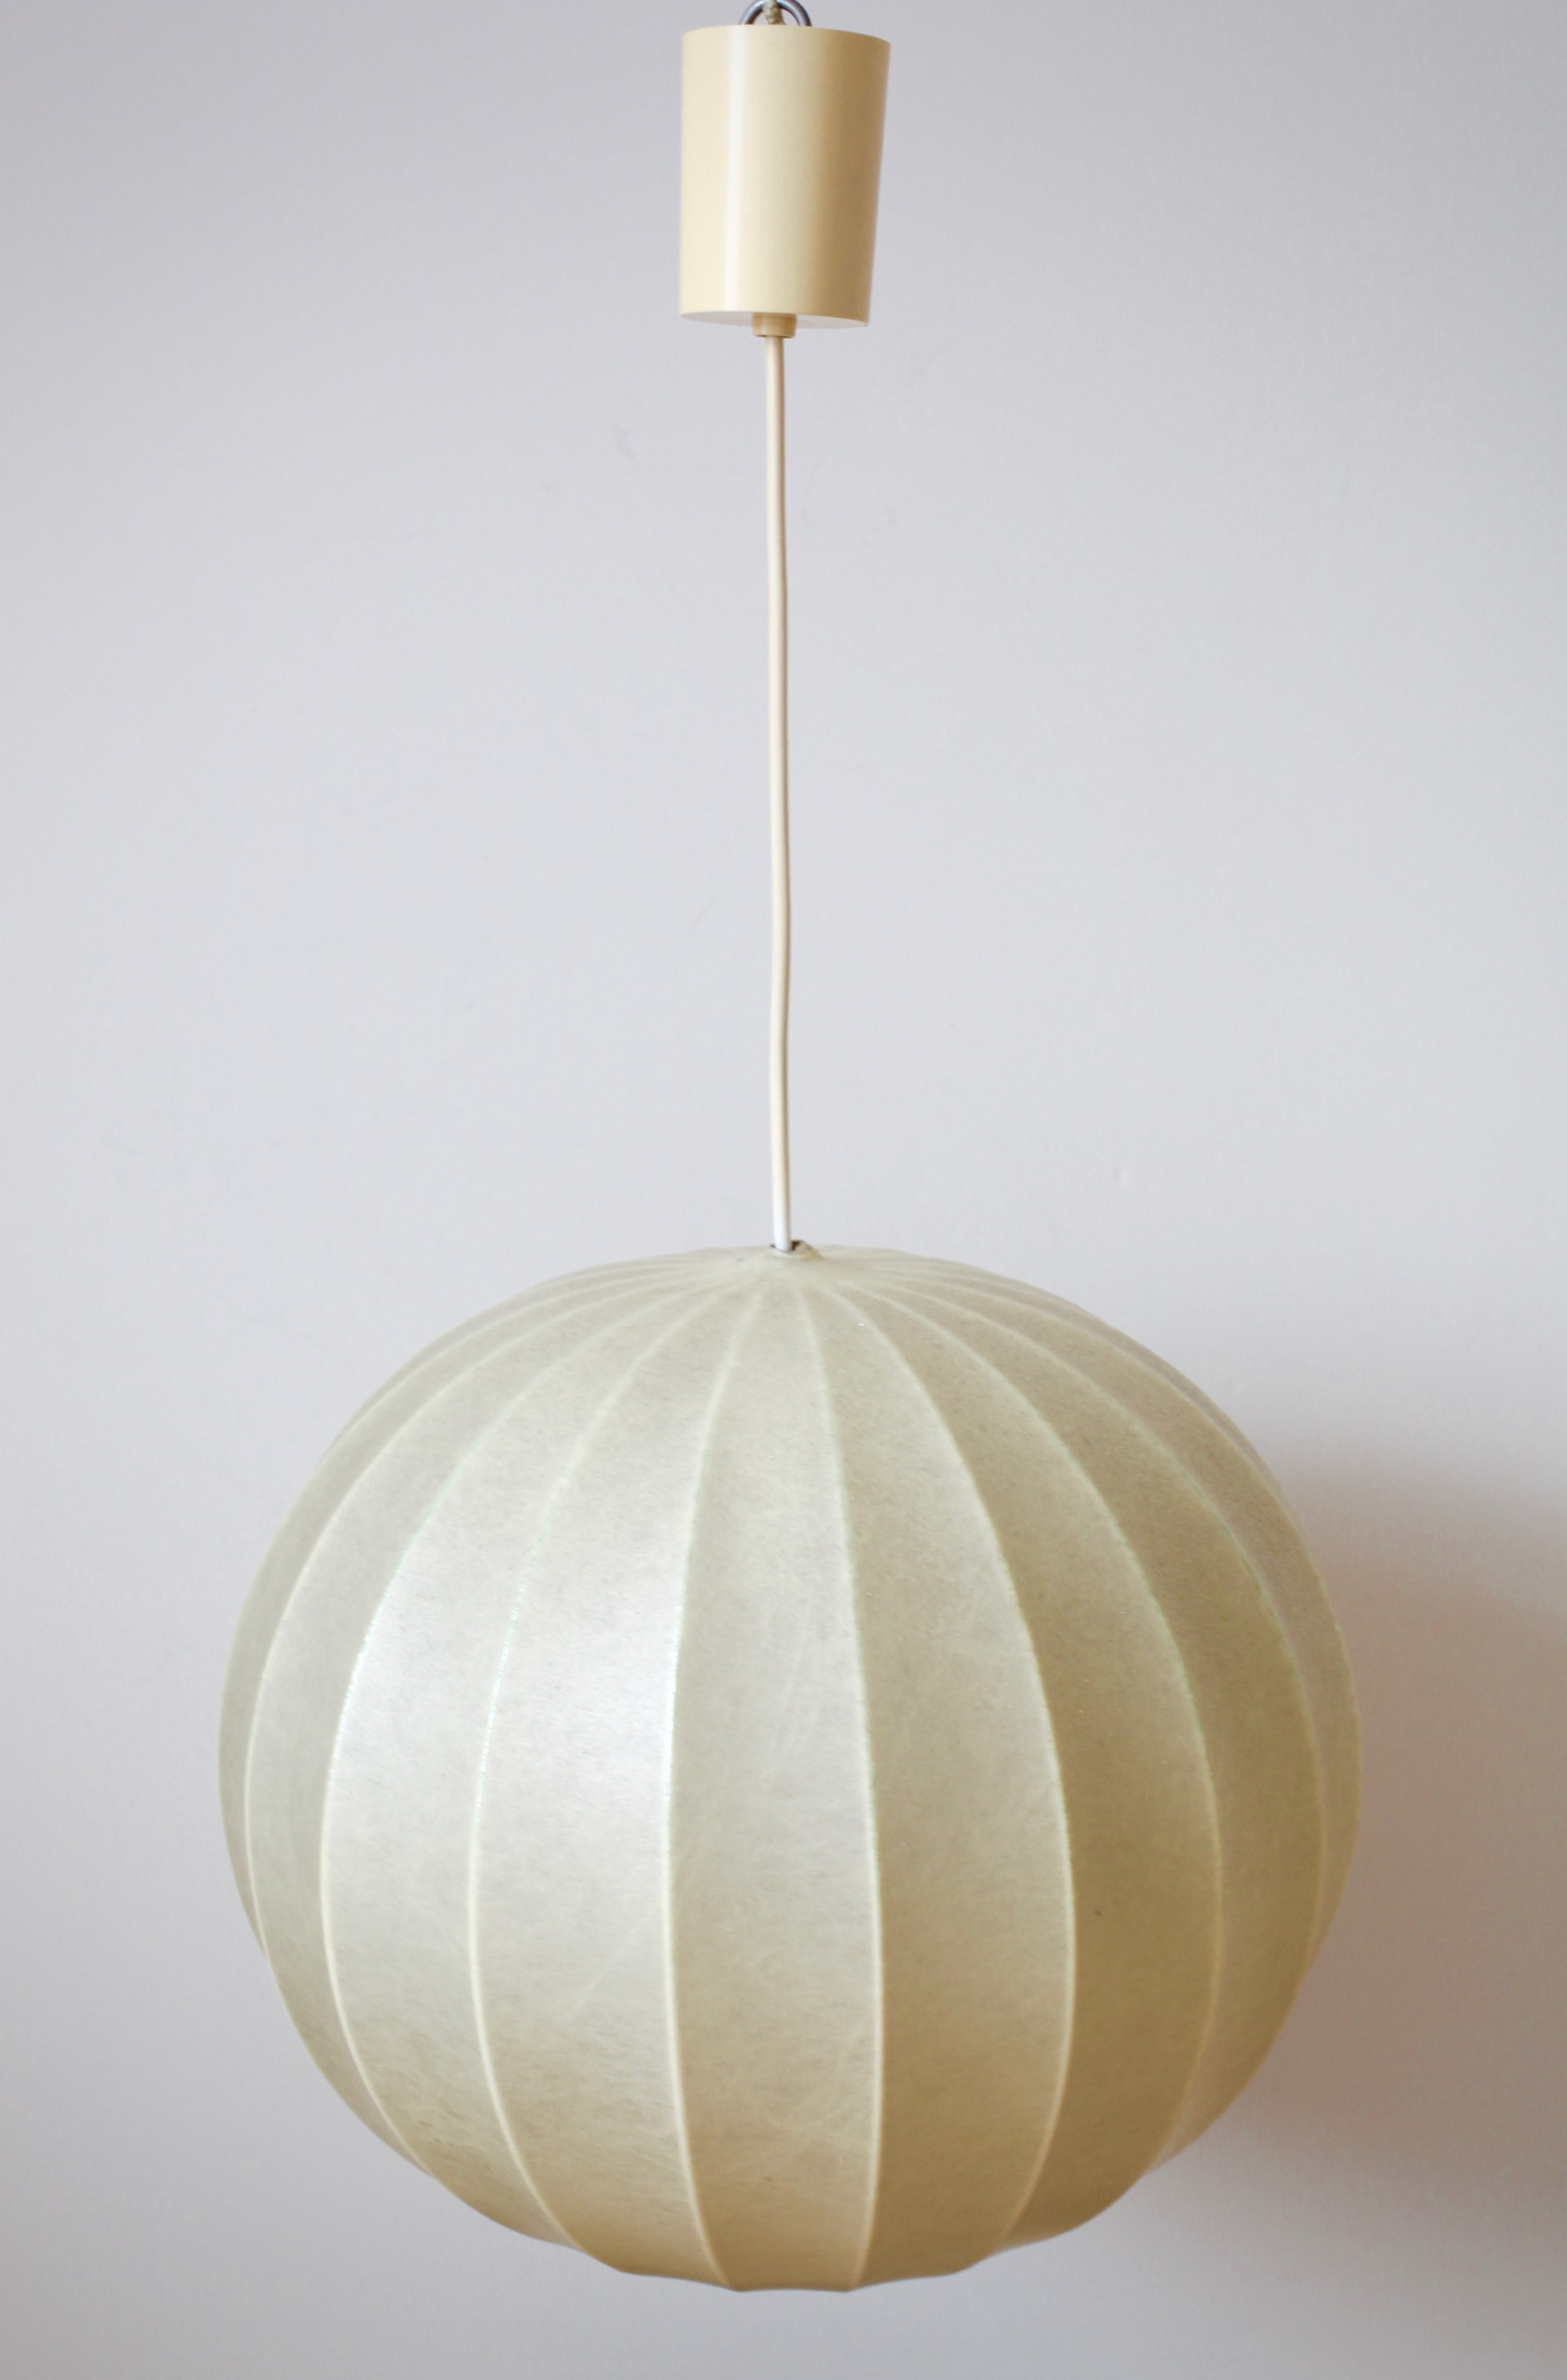 60er jahre cocoon lampe raumwunder vintage wohnen in. Black Bedroom Furniture Sets. Home Design Ideas